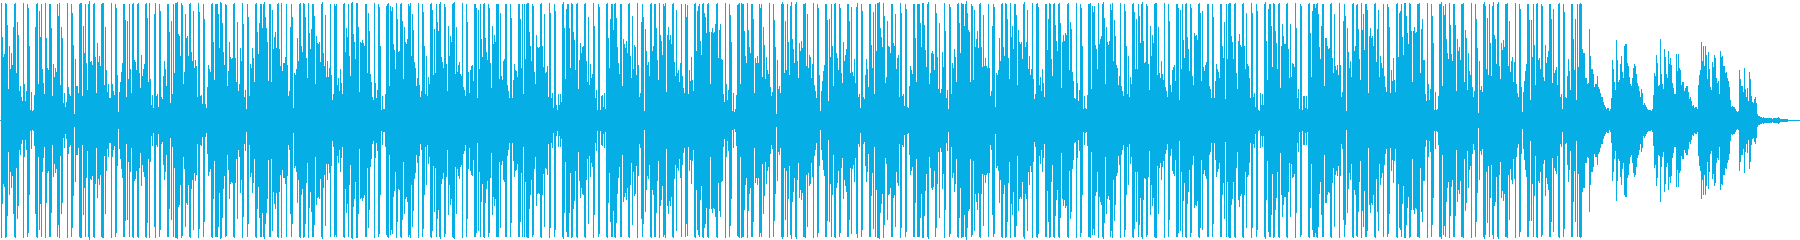 Lofi Hiphop ピアノ 穏やかの再生済みの波形